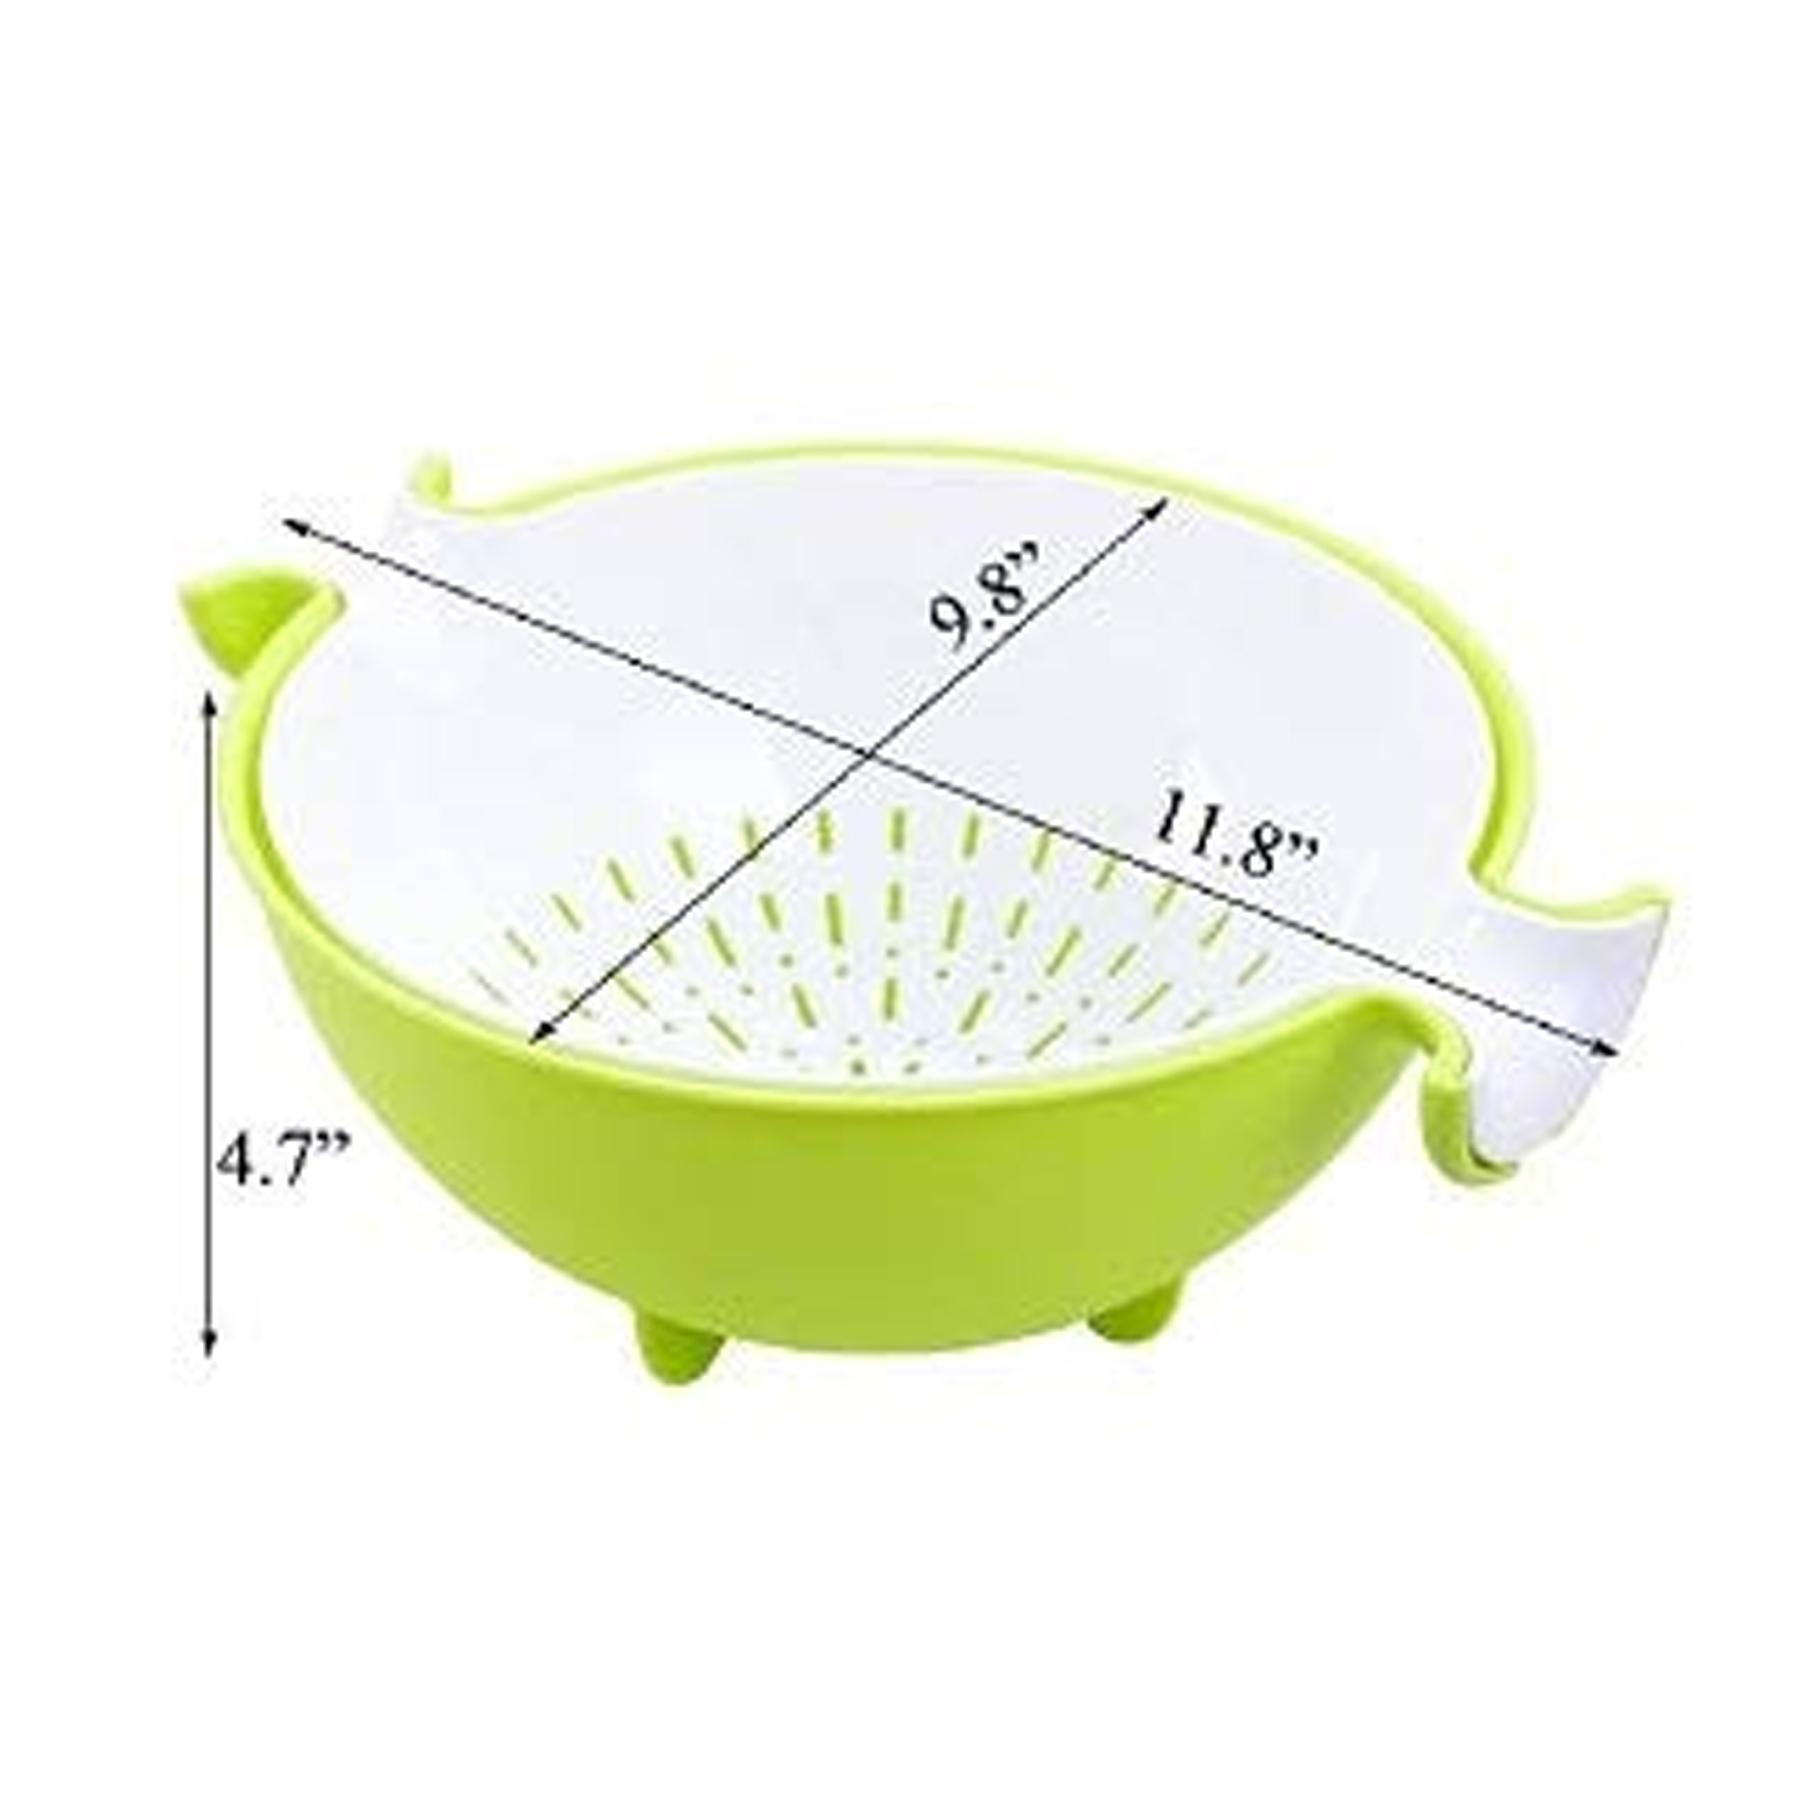 Multifunctional Washing Fruit Vegetables Draining Basket Strainer Bowl